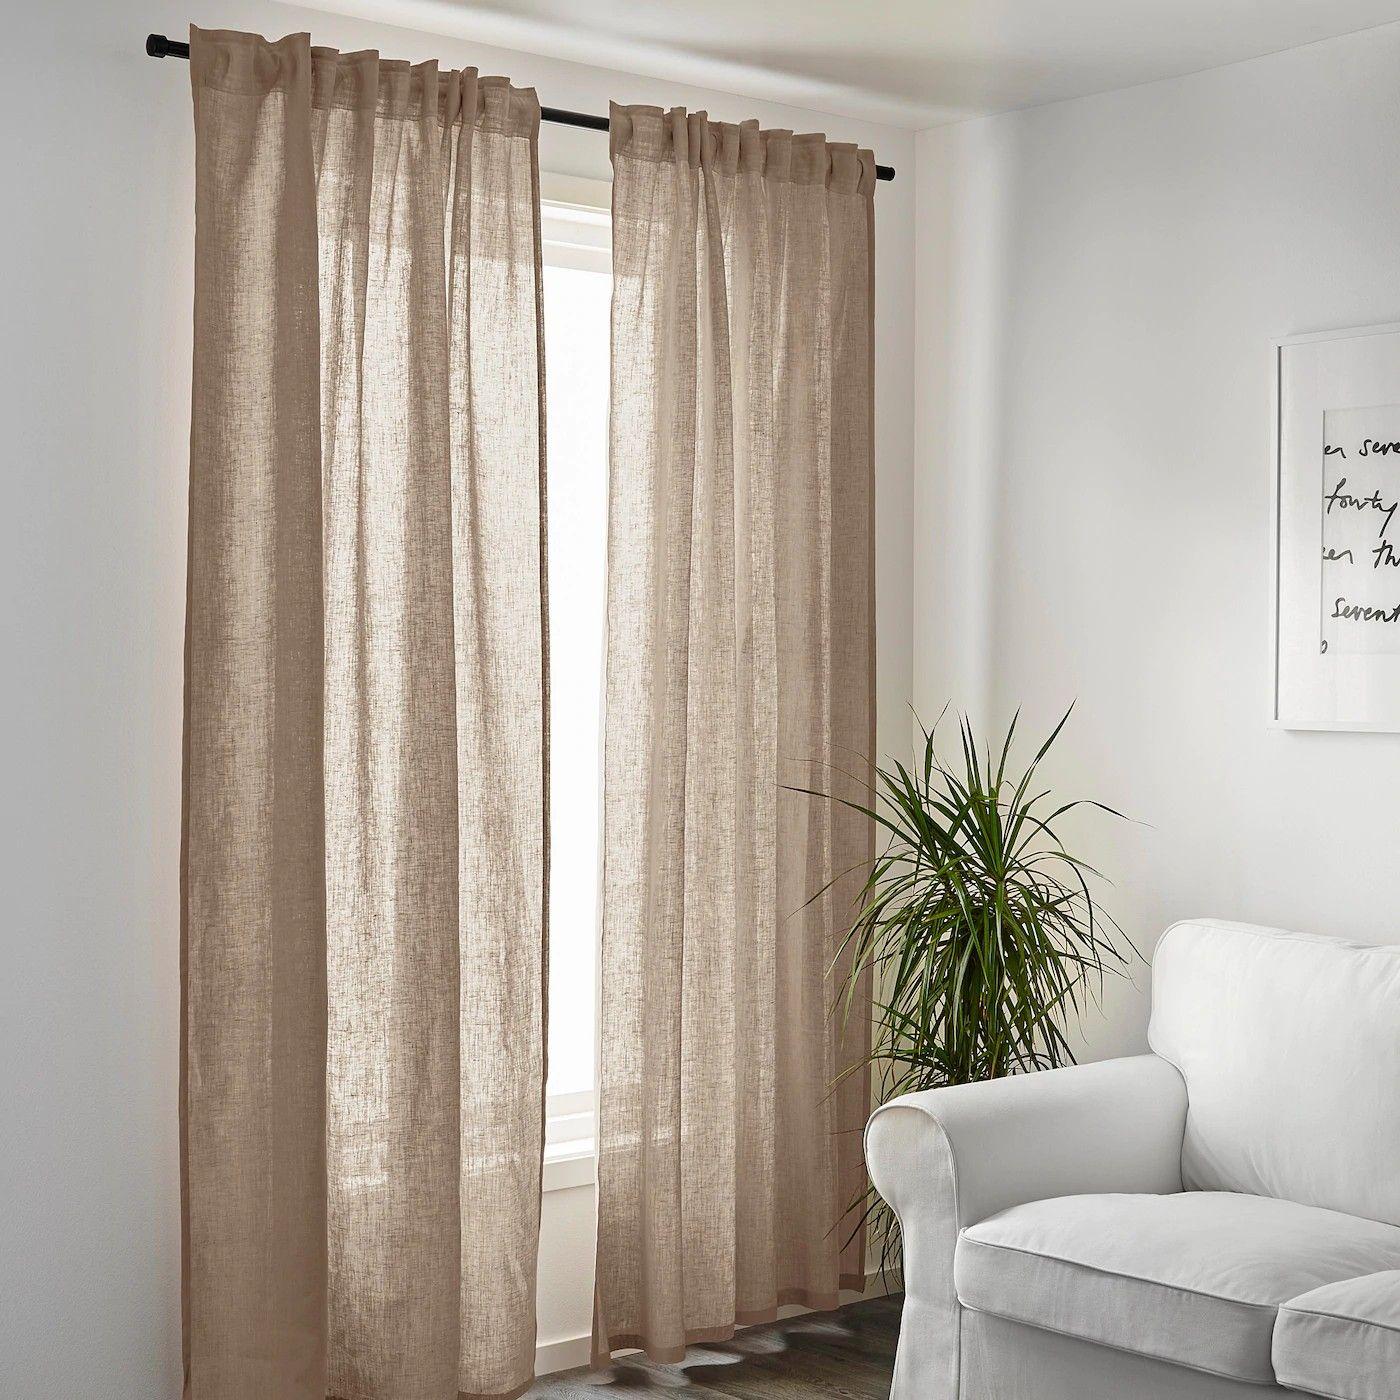 La tenda hi tech per eccellenza si adatta a case, uffici e ambienti contract. Ikea Curtains Tende Beige Tende A Pannello Idee Ikea